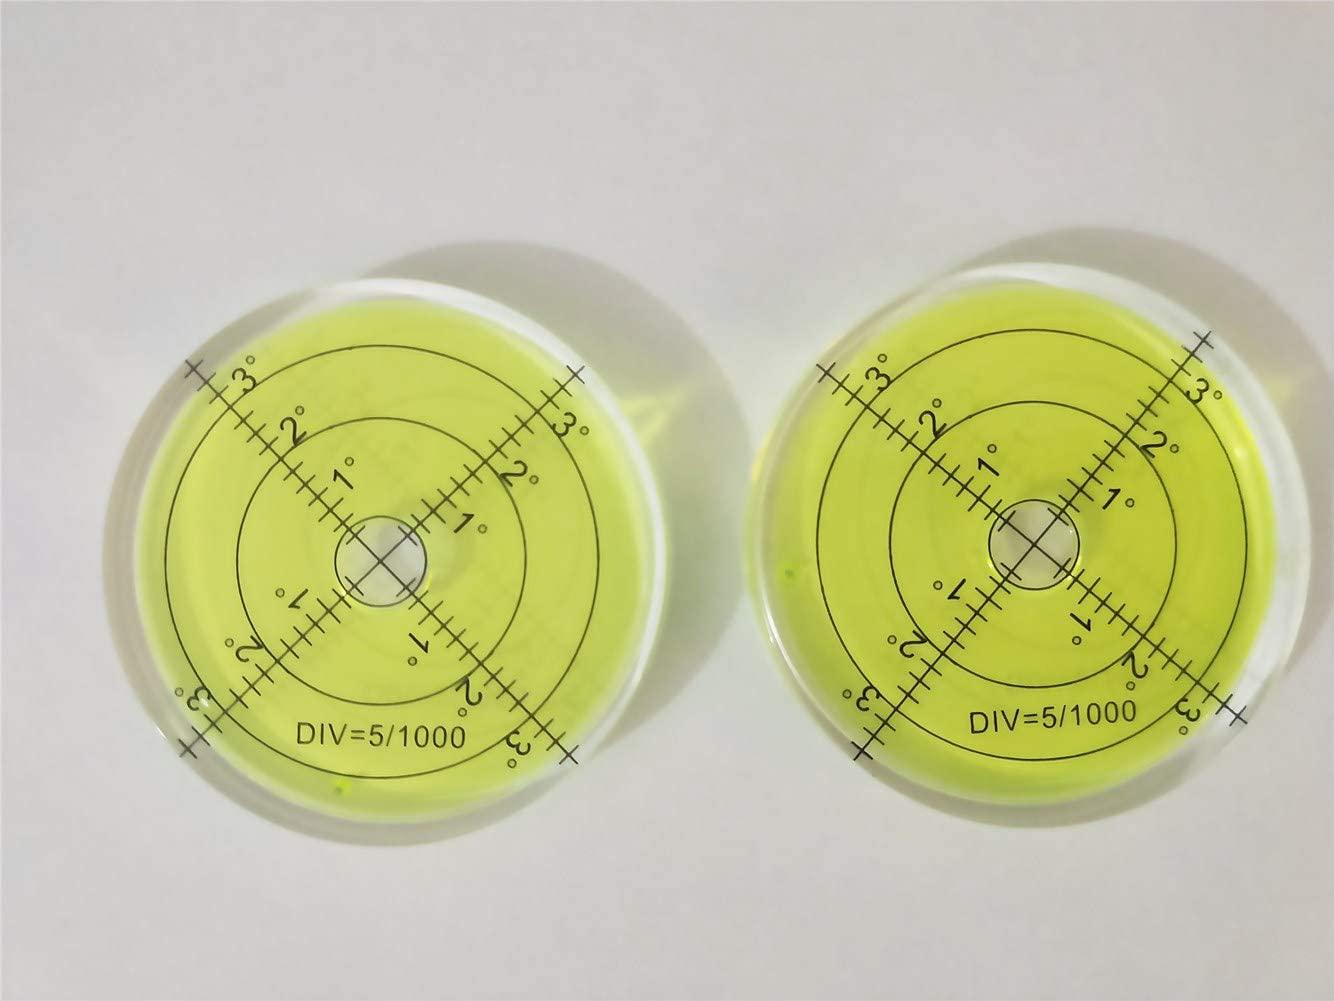 2PCS Bubble Level Bubble Spirit Levels 66x10mm Circular Bullseye Bubble for Leveling Camera Tripod Phonograph Furniture Measuring Tools (A-Color)